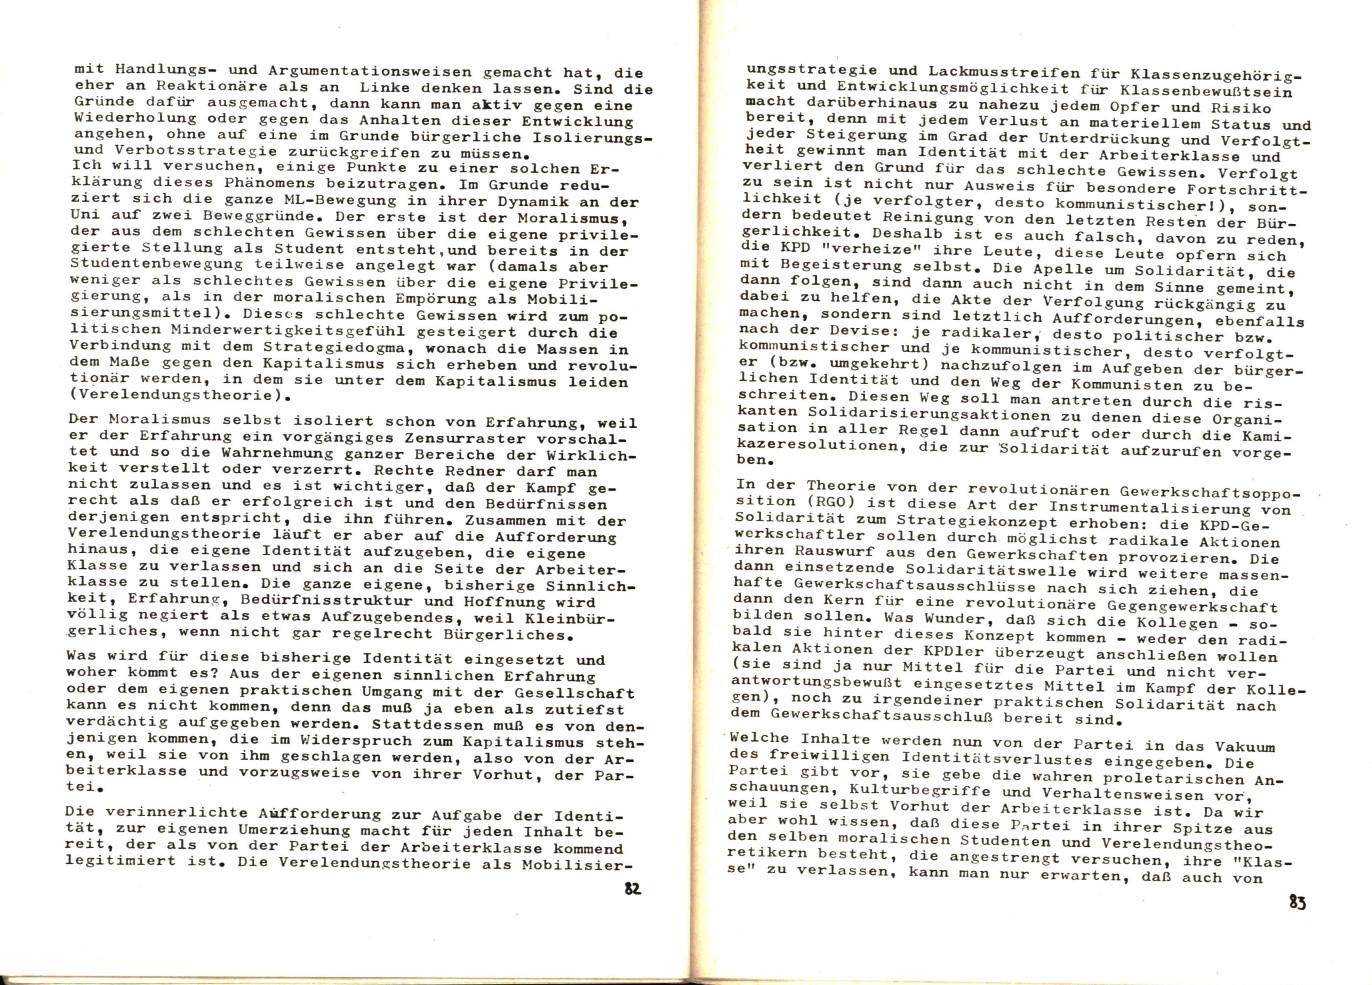 Berlin_KSV_1975_Dokumente_der_SAZ_43